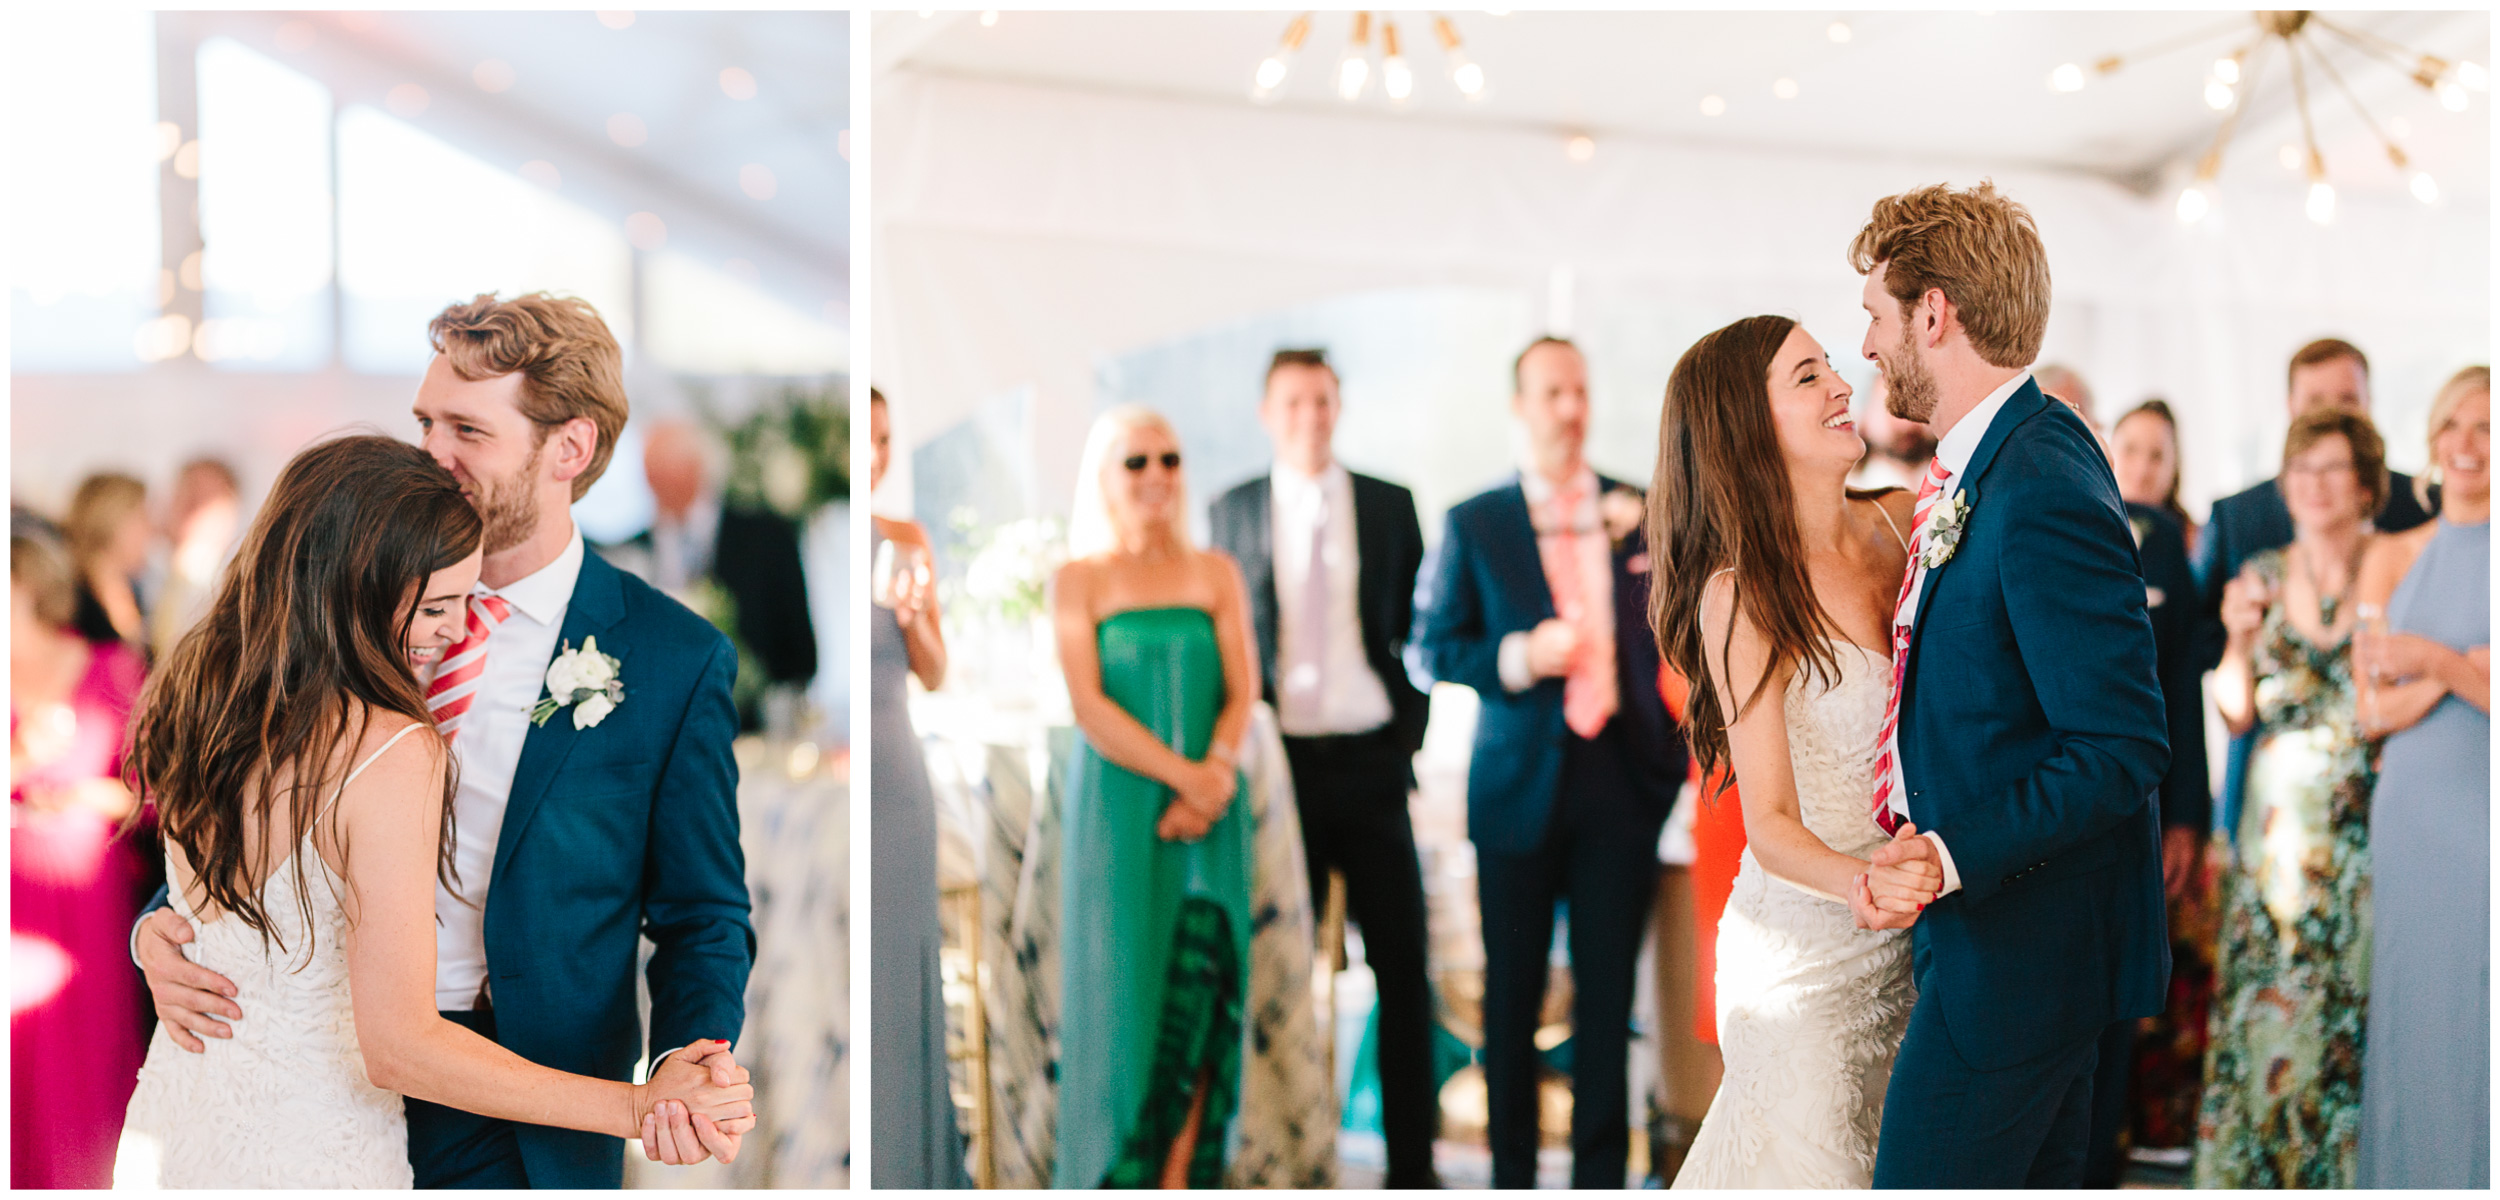 crested_butte_wedding_109.jpg